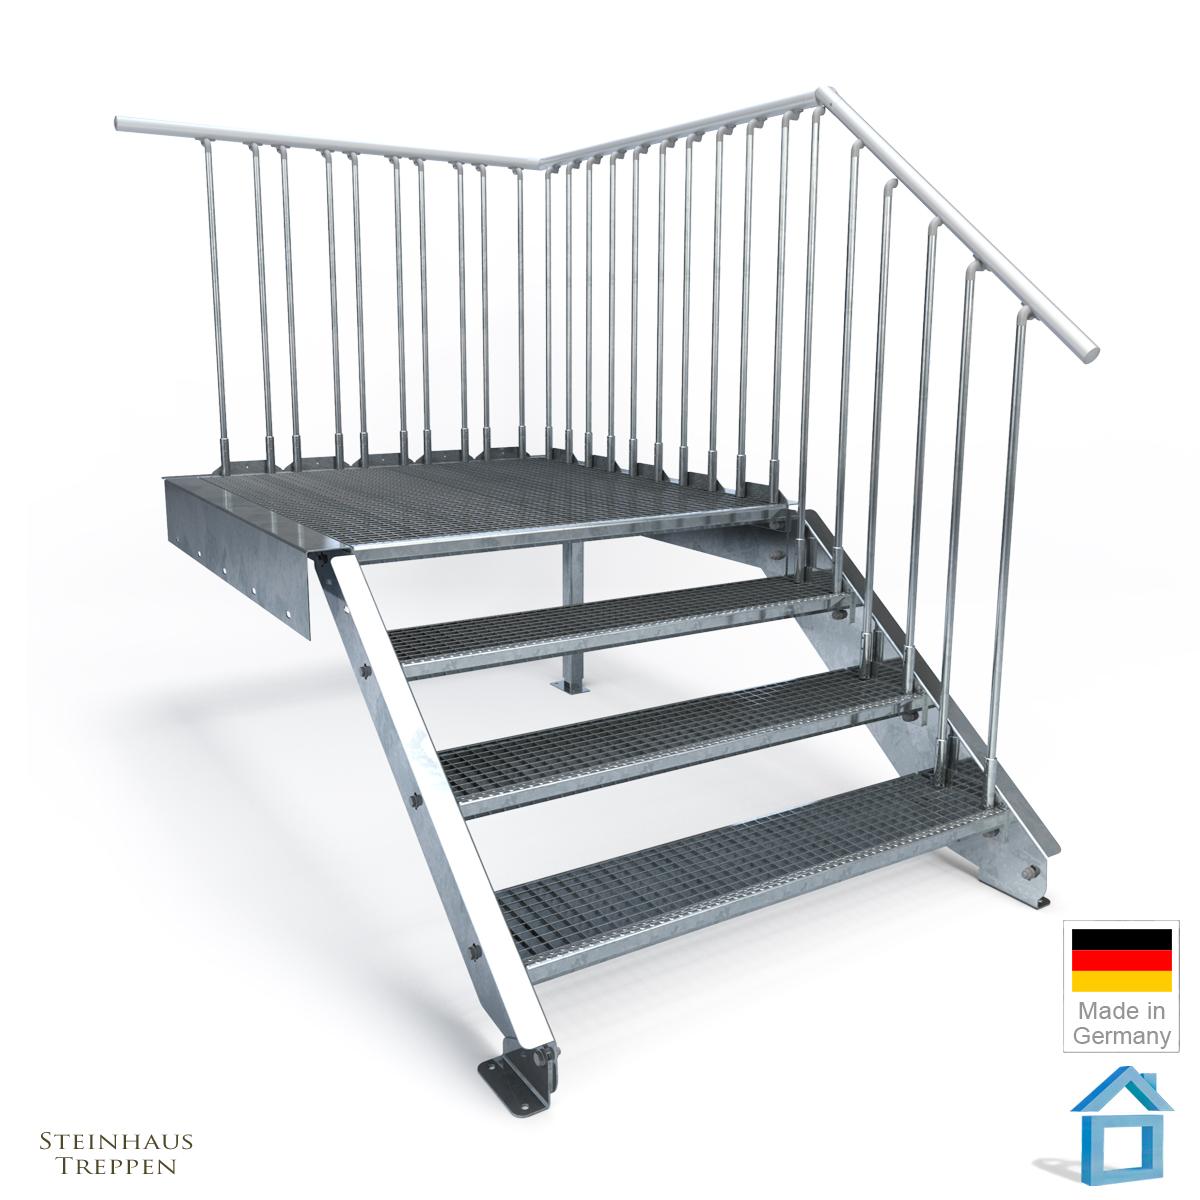 treppen gnstig trendy treppe kaufen hpl treppe kaufen treppenbau vo your stair with treppen. Black Bedroom Furniture Sets. Home Design Ideas